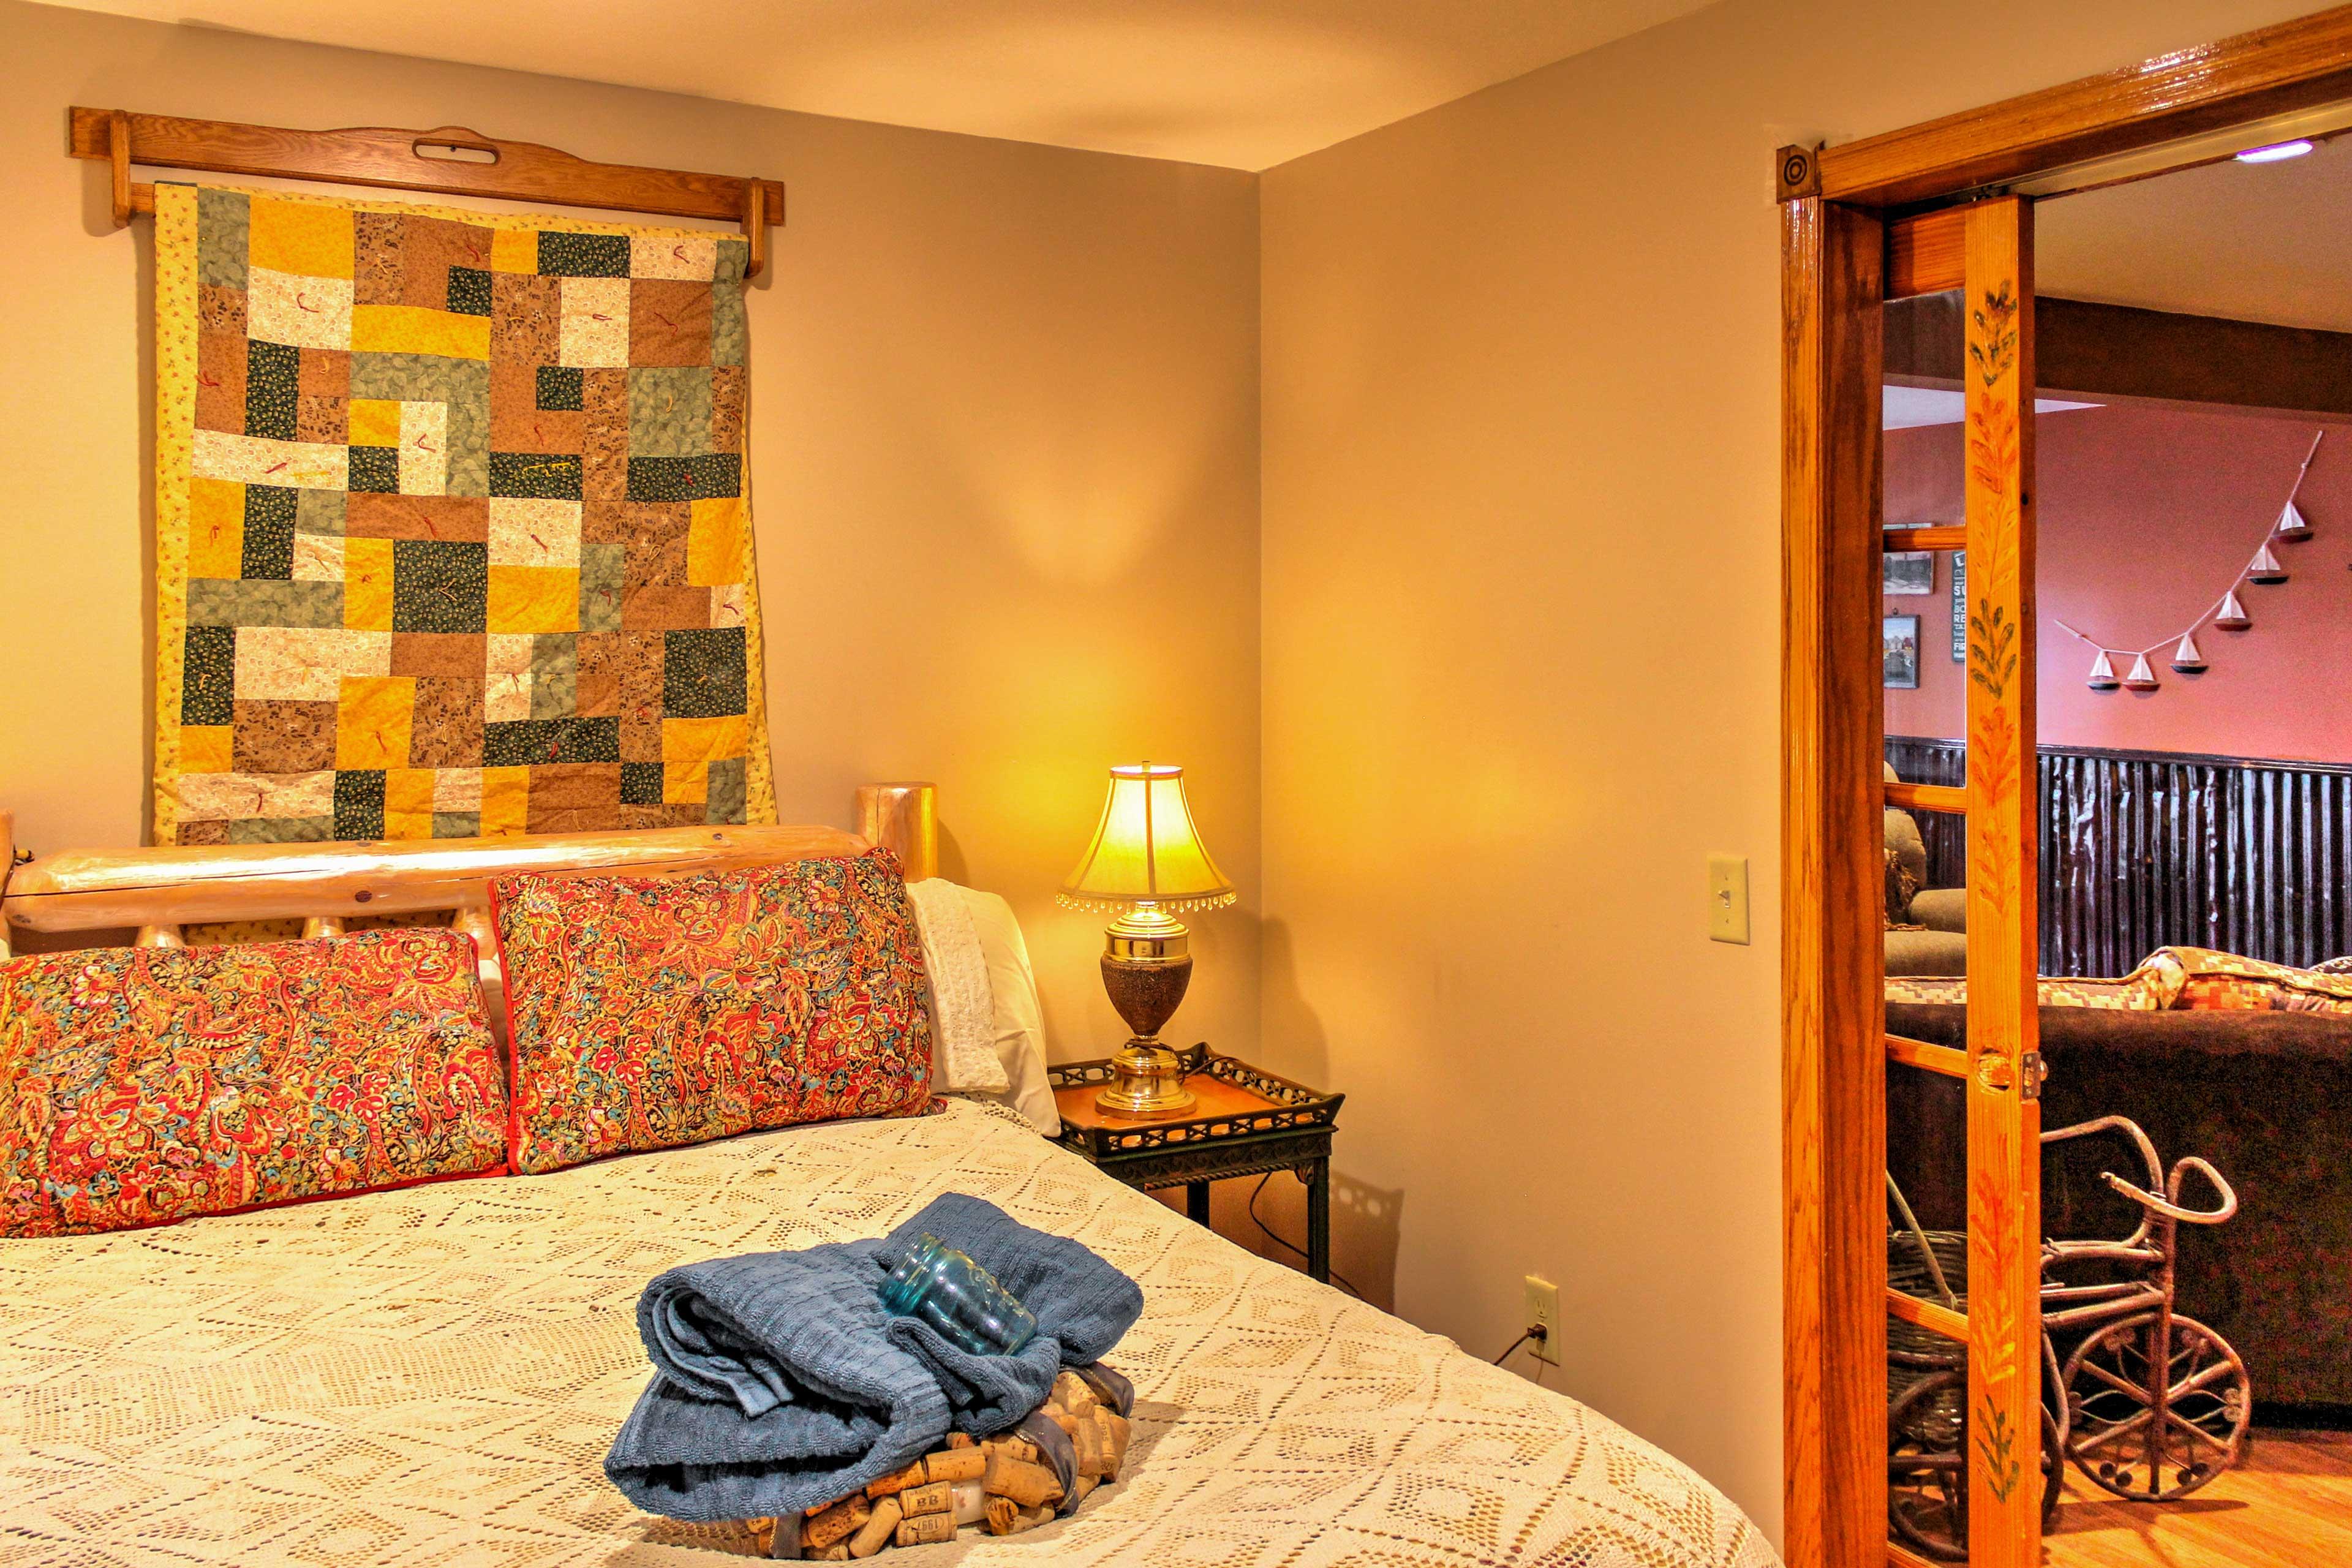 Sleep easy in this cozy bedroom.